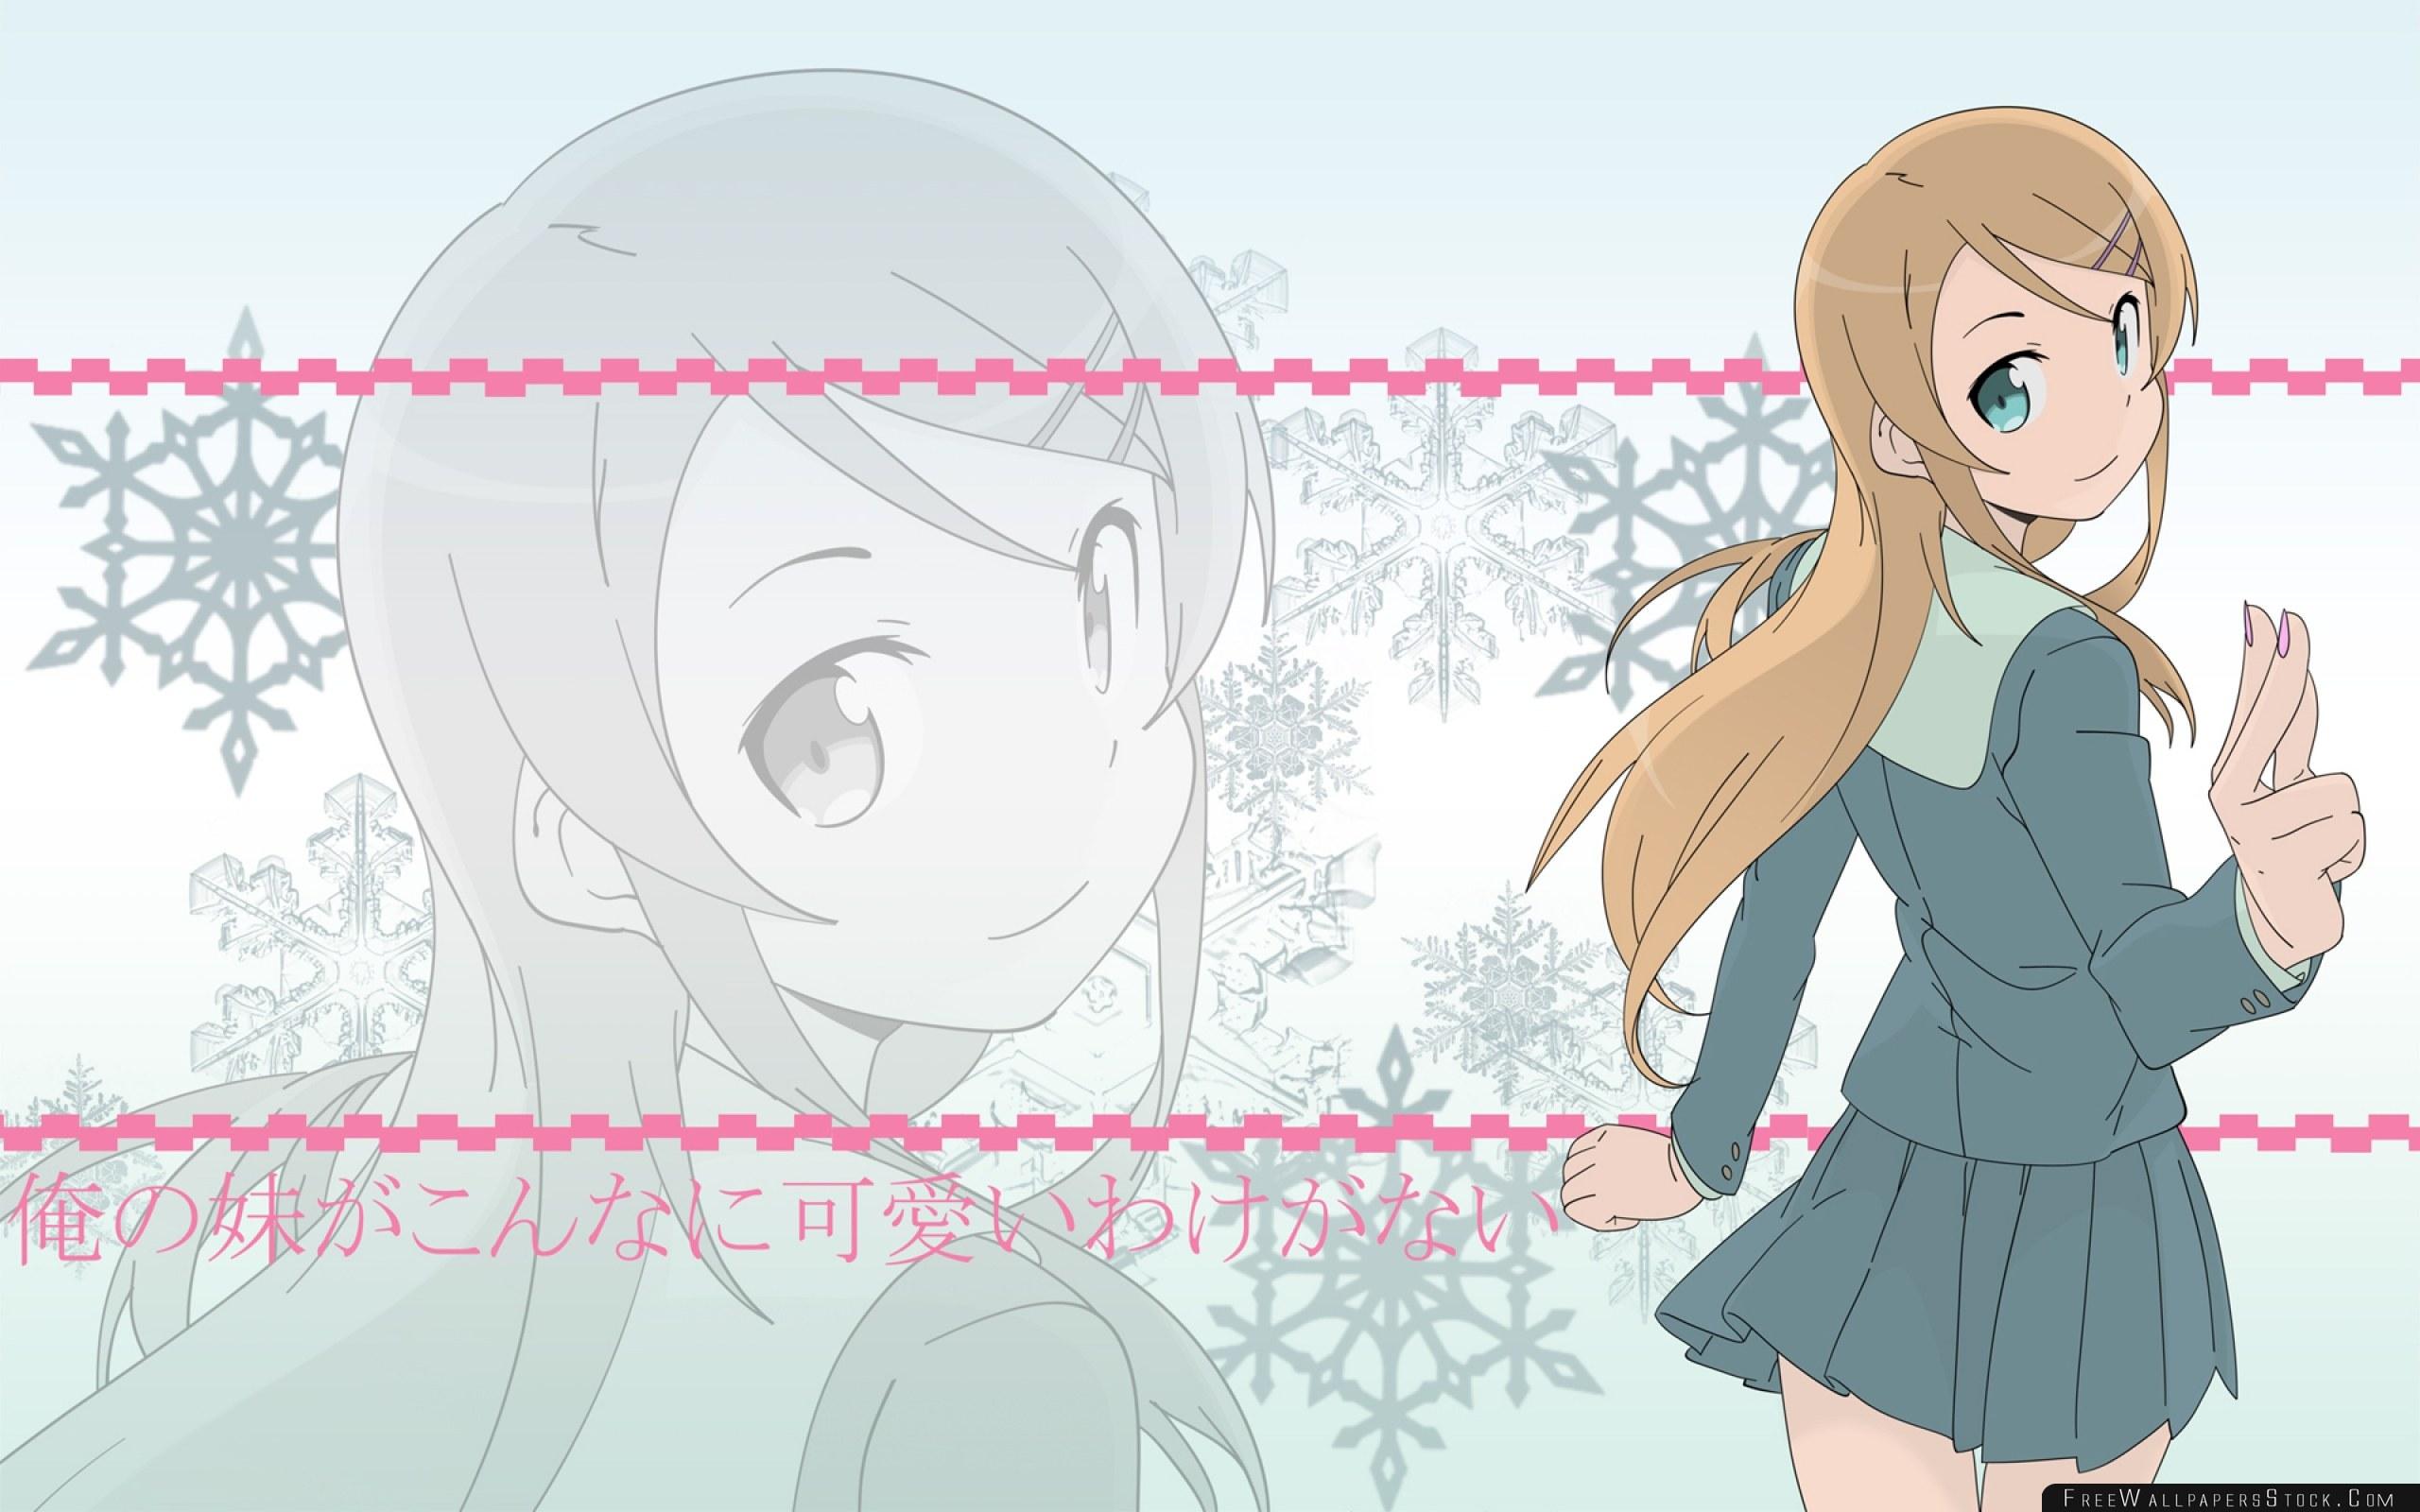 Download Free Wallpaper Anime Girl Brunette Schoolgirl